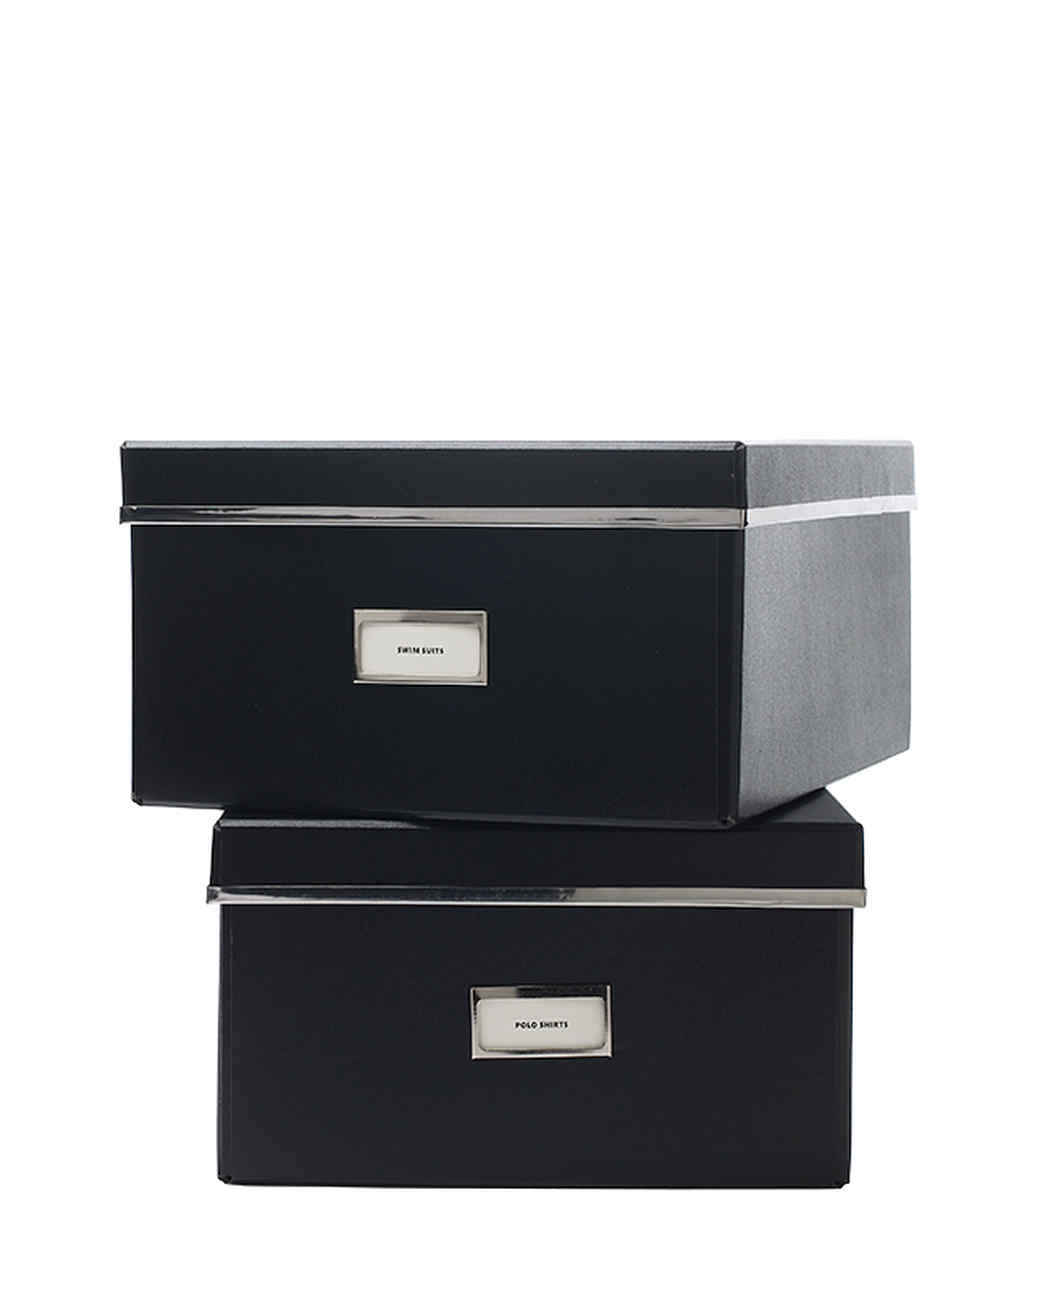 mld105280_0110_clothing_boxes2.jpg